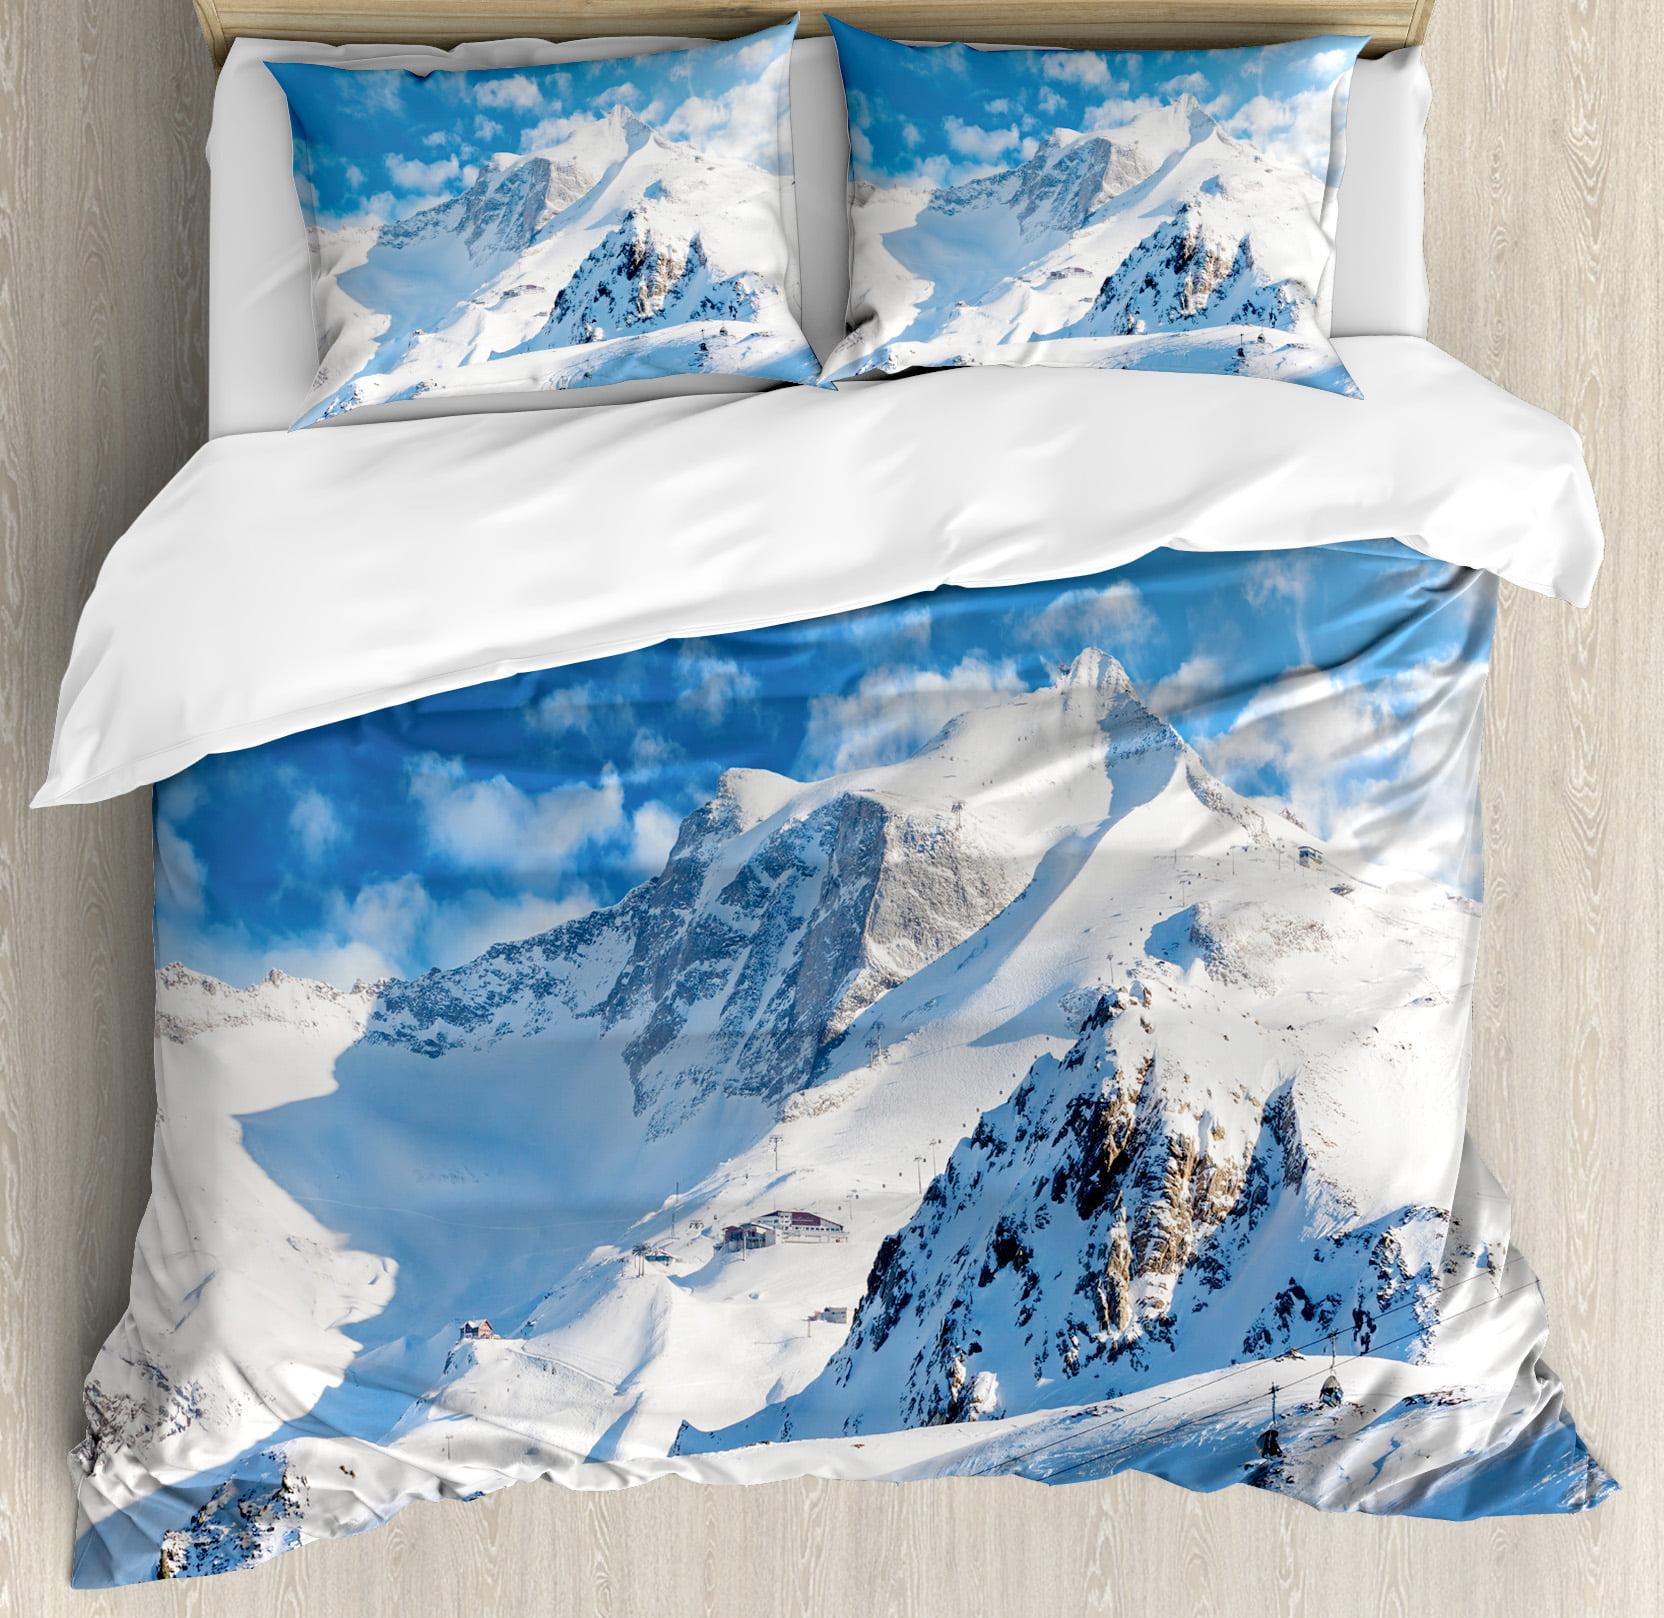 Lake House Decor Queen Size Duvet Cover Set, Mountain Landscape Ski Slope Winter Sport Telfer and Snowboarding IMage, Decorative 3 Piece... by Kozmos